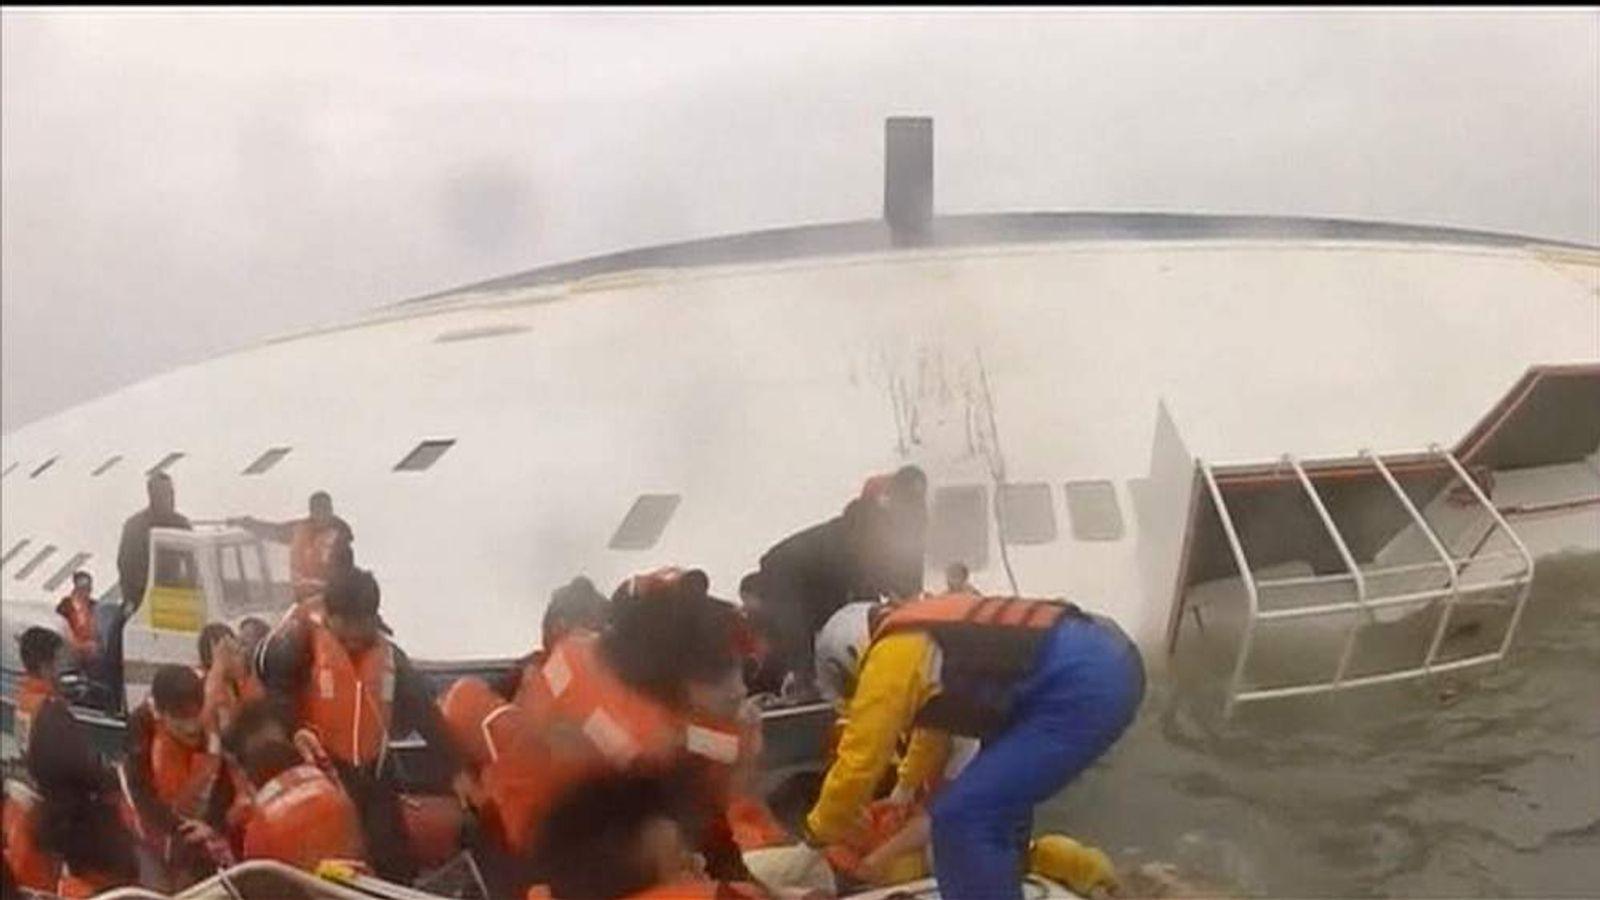 Korea ferry rescue